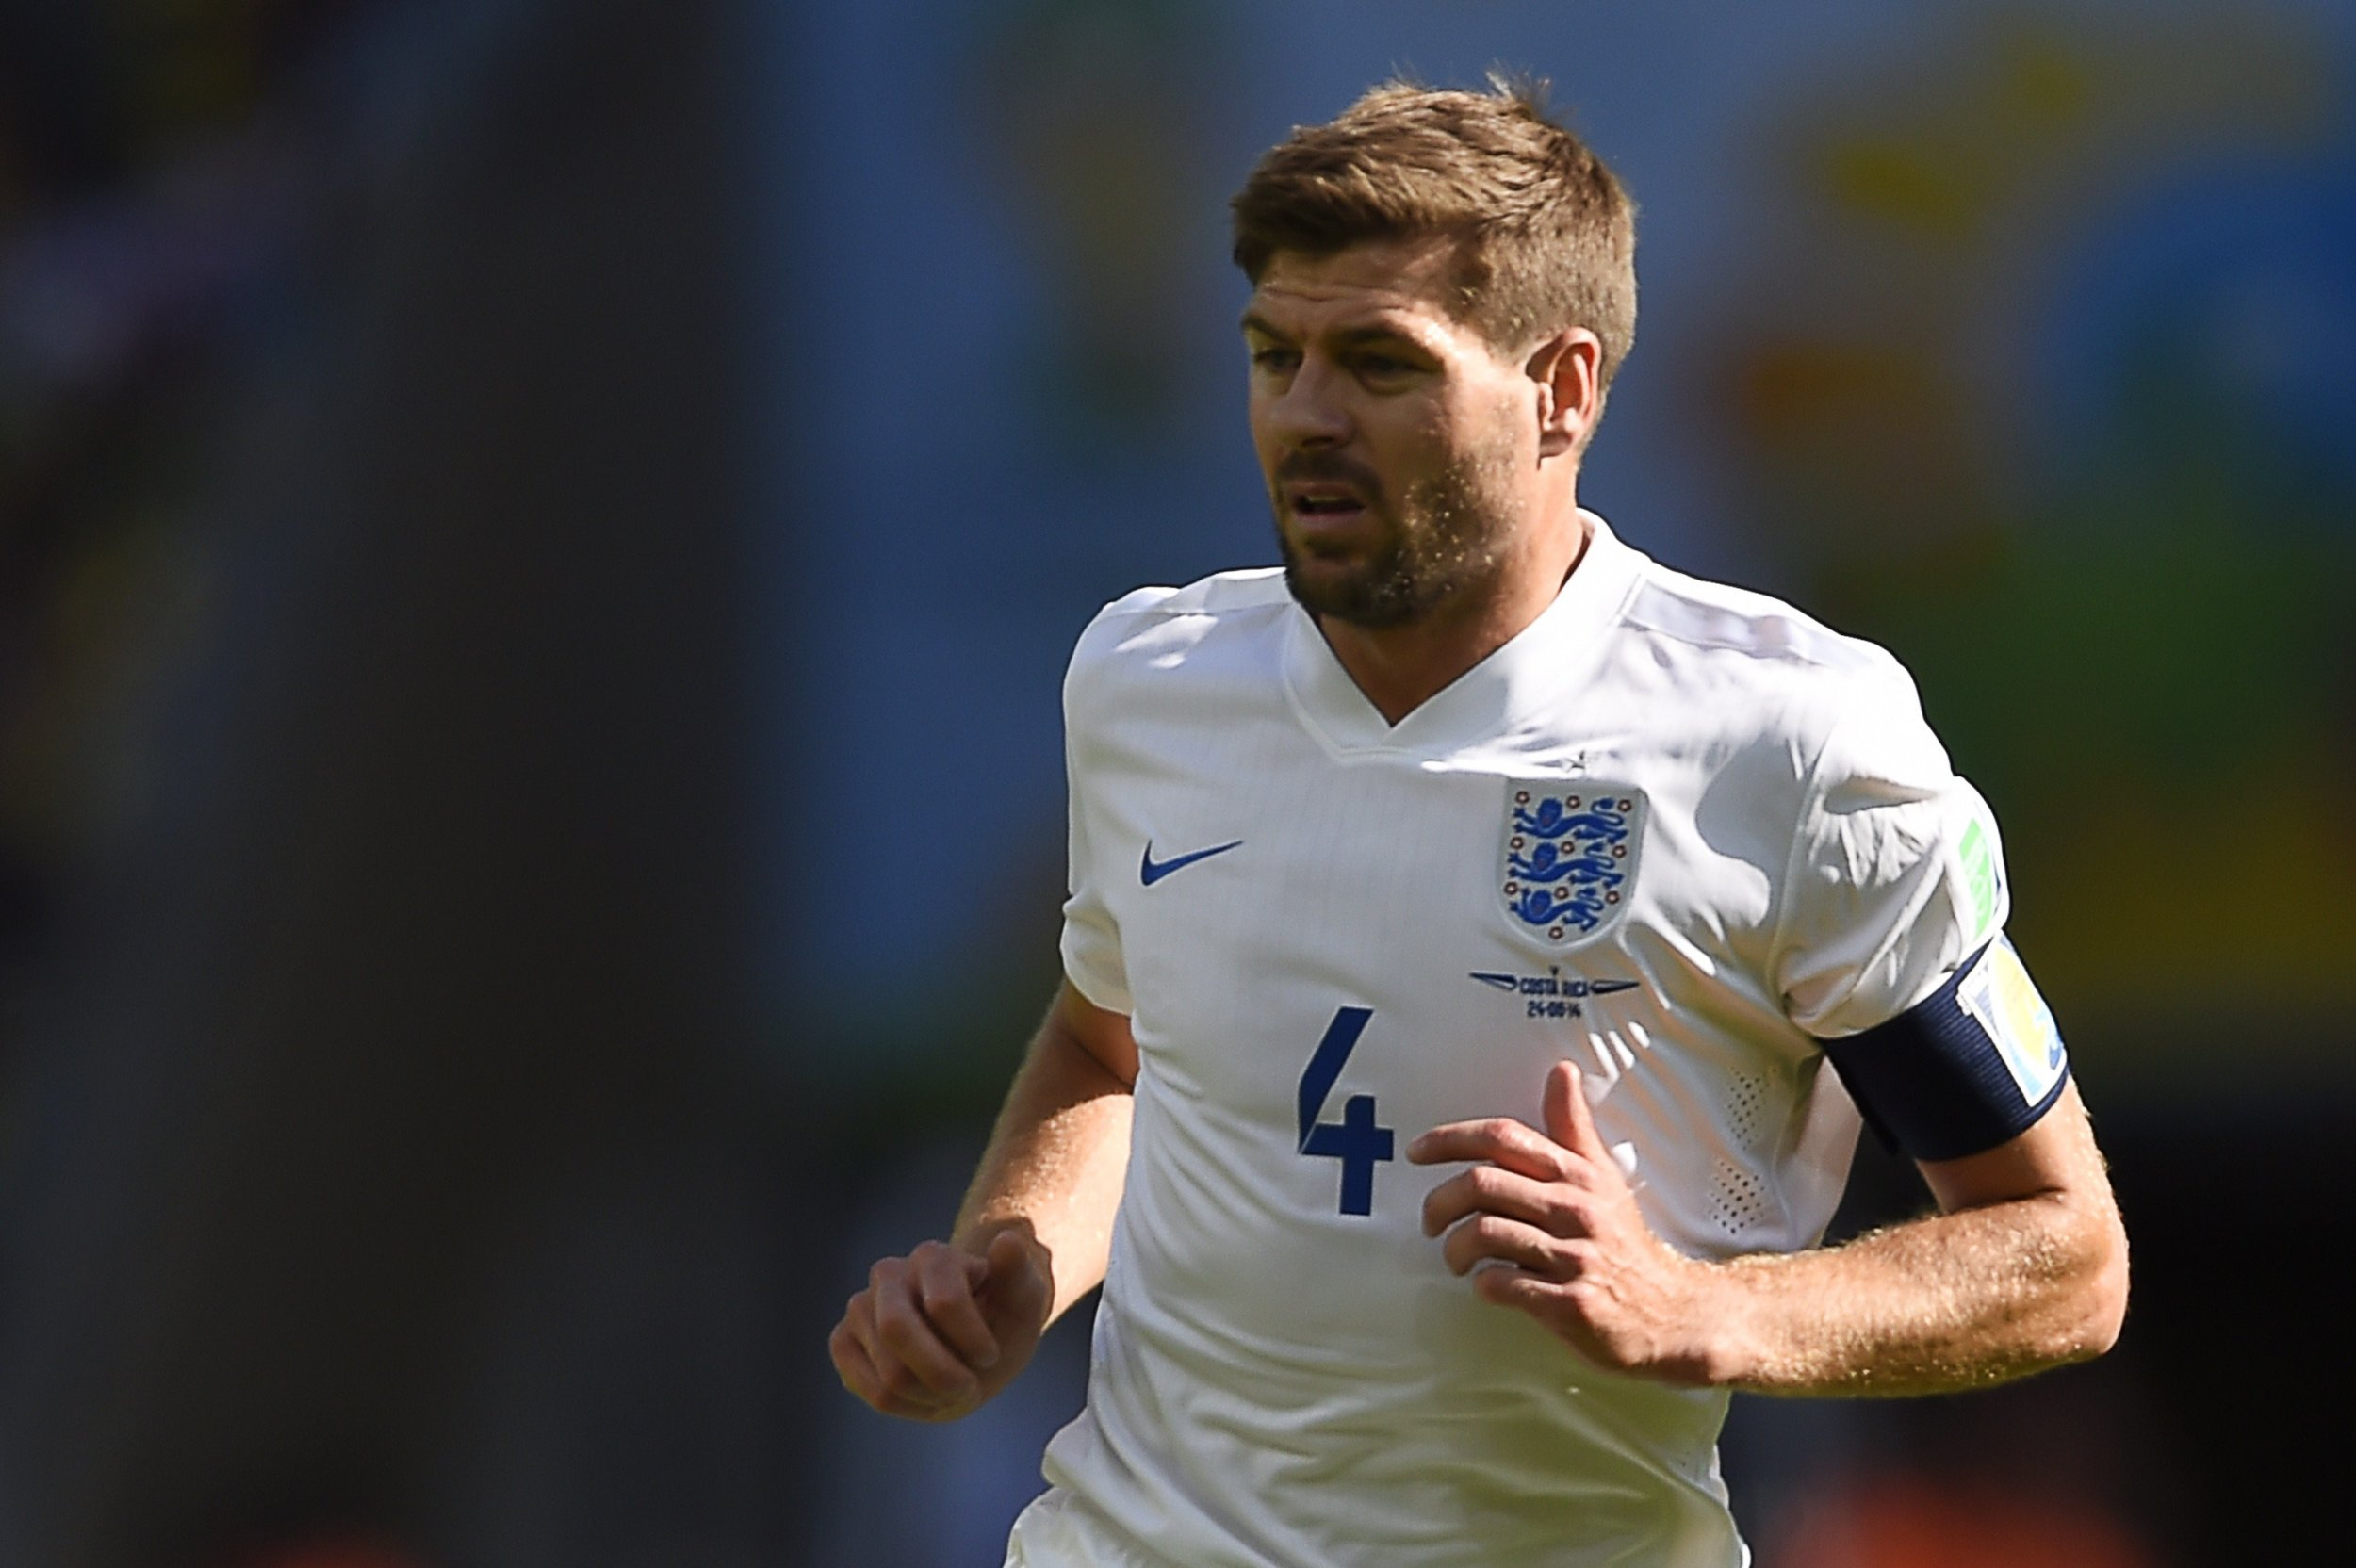 Steven Gerrard: England Needs Ex-Players in Coaching Roles